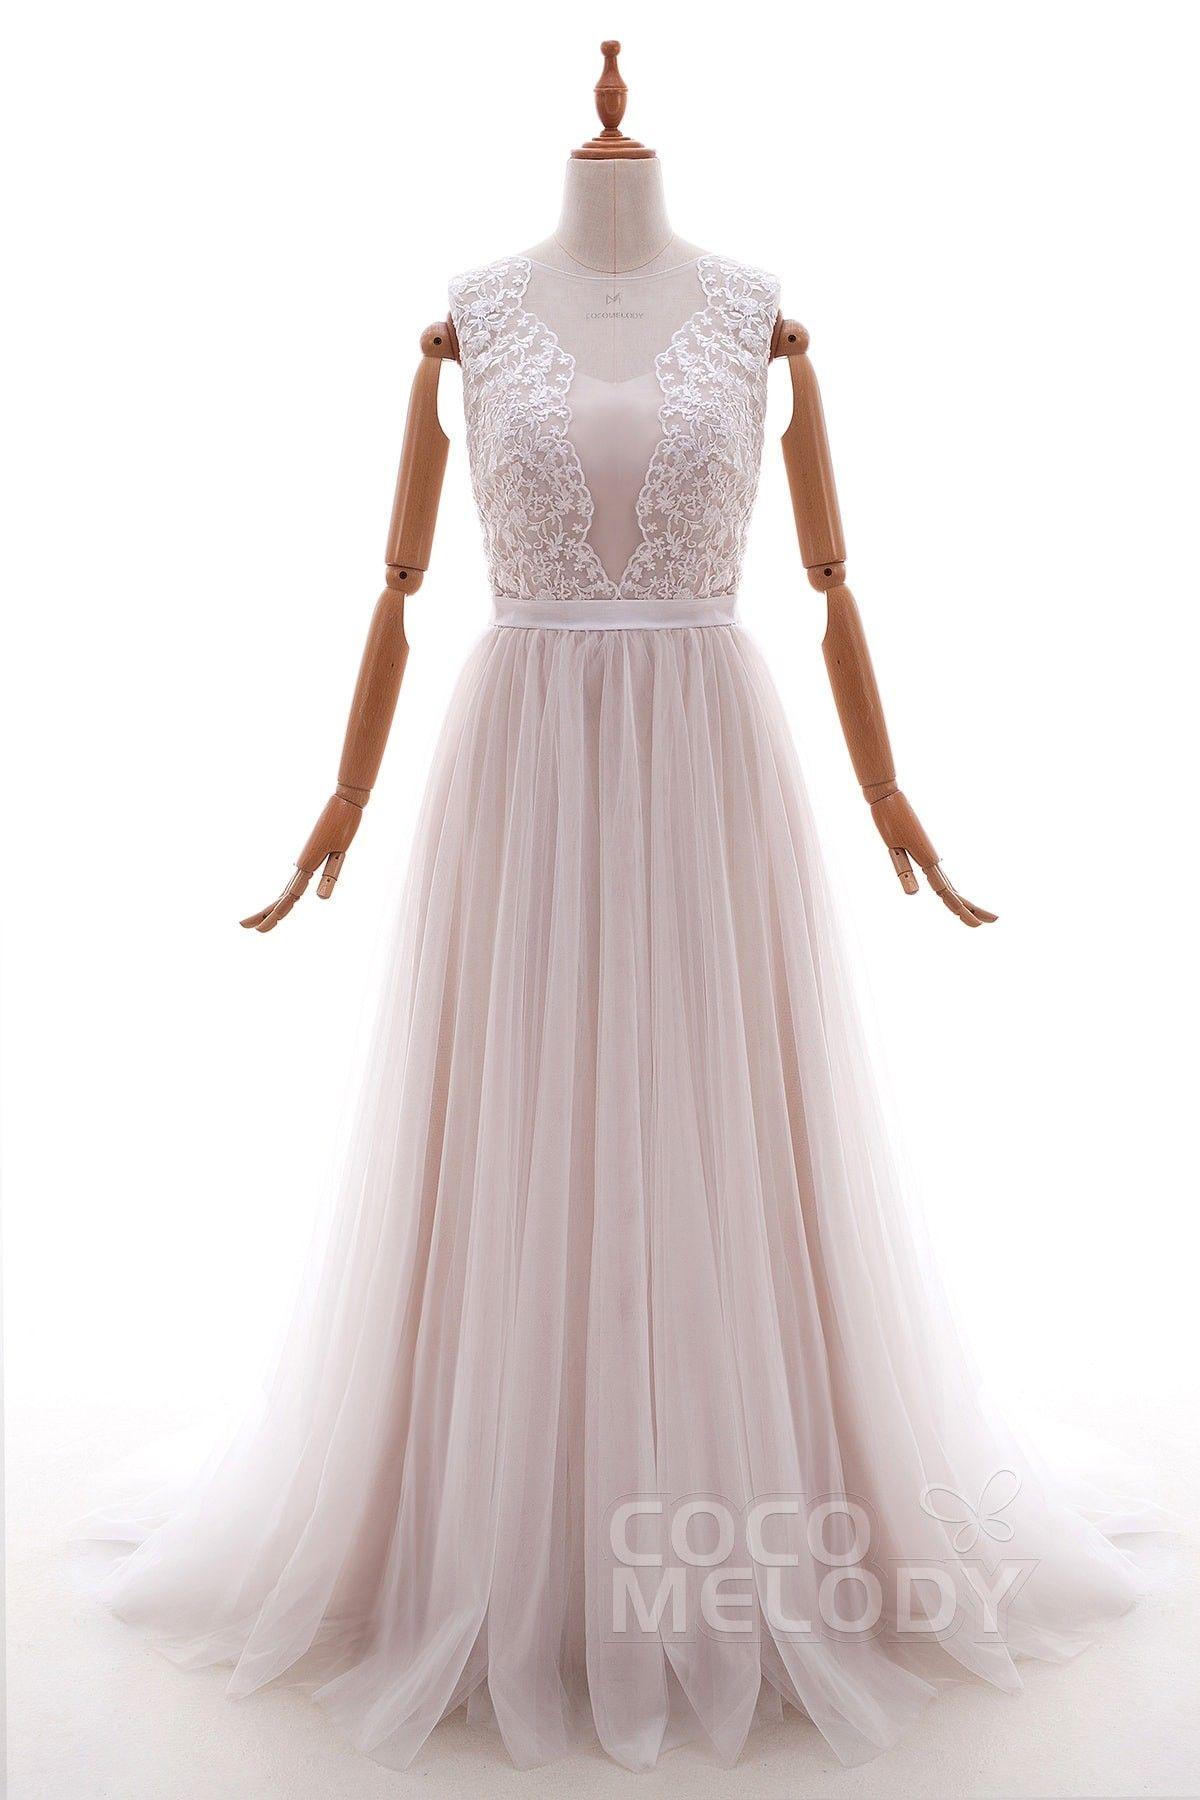 Beach wedding dress under 500  SheathColumn SweepBrush Train Tulle and Lace Wedding Dress LD